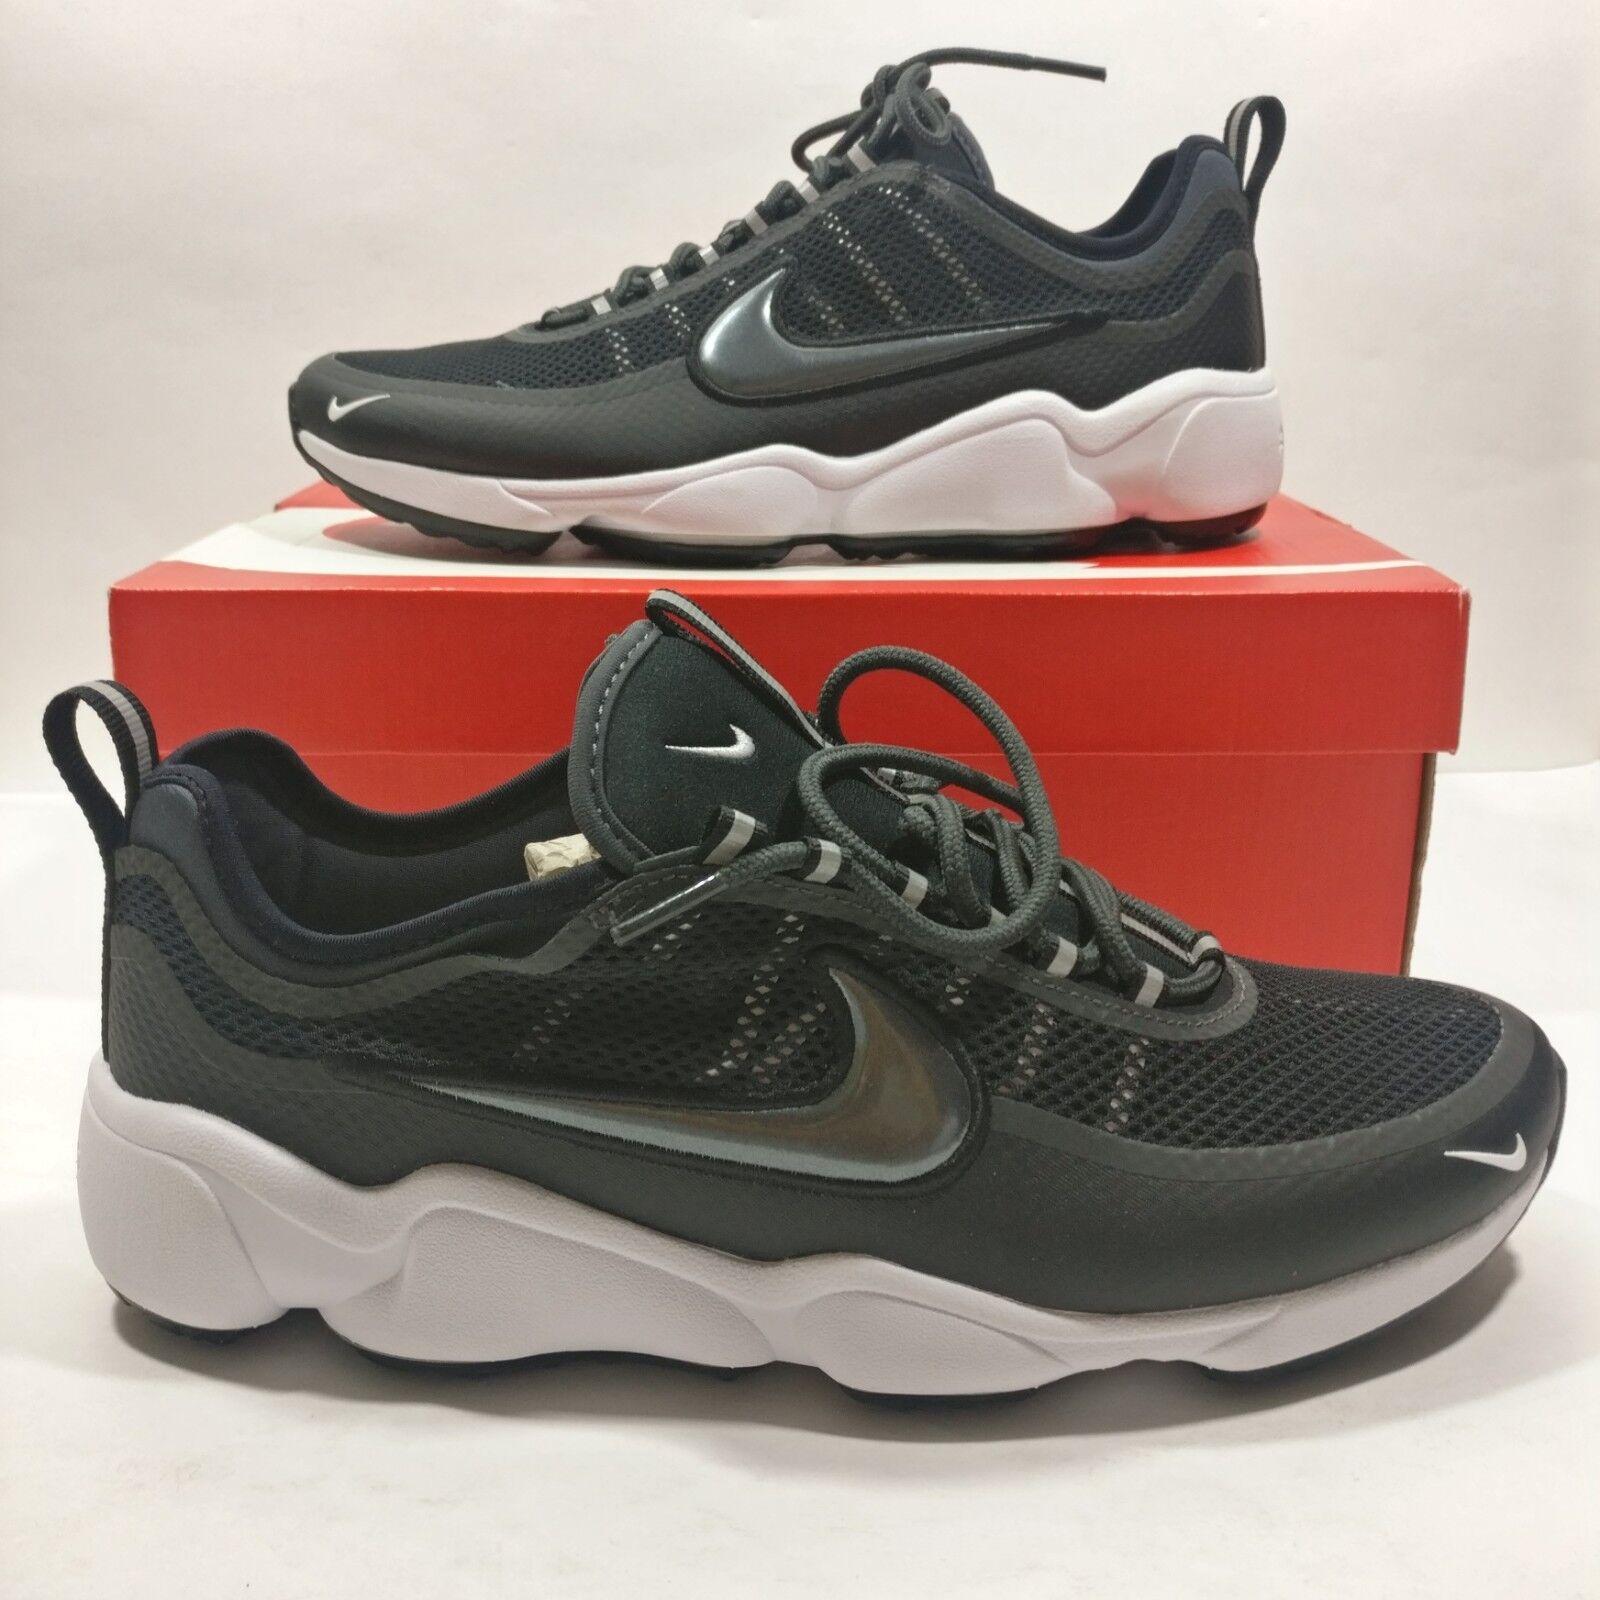 Mens Nike Air Zoom Black Spiridon Running Training Shoes Black Zoom Multi Size 876267-003 fed43f